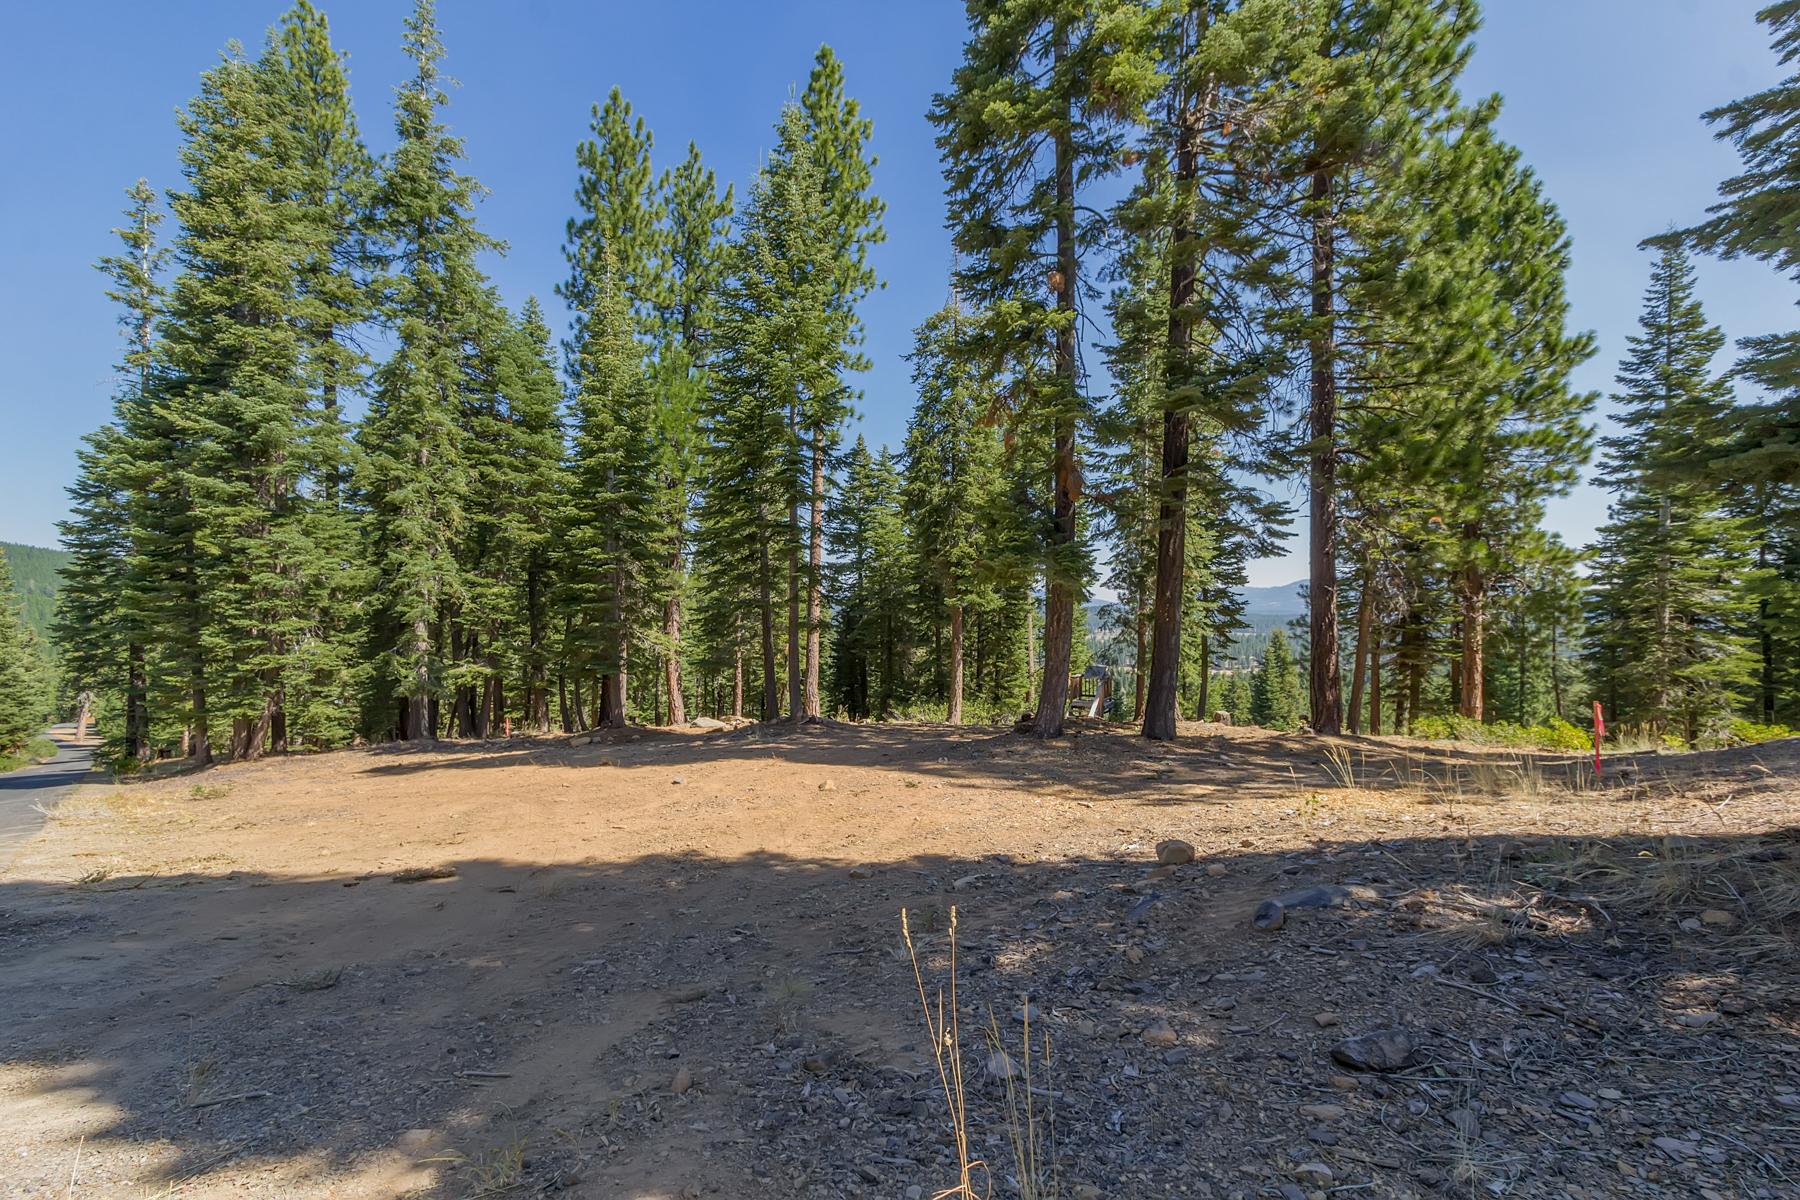 Additional photo for property listing at 12431 Stony Ridge Court Truckee, California 96162 12431 Stoney Ridge Truckee, California 96161 United States